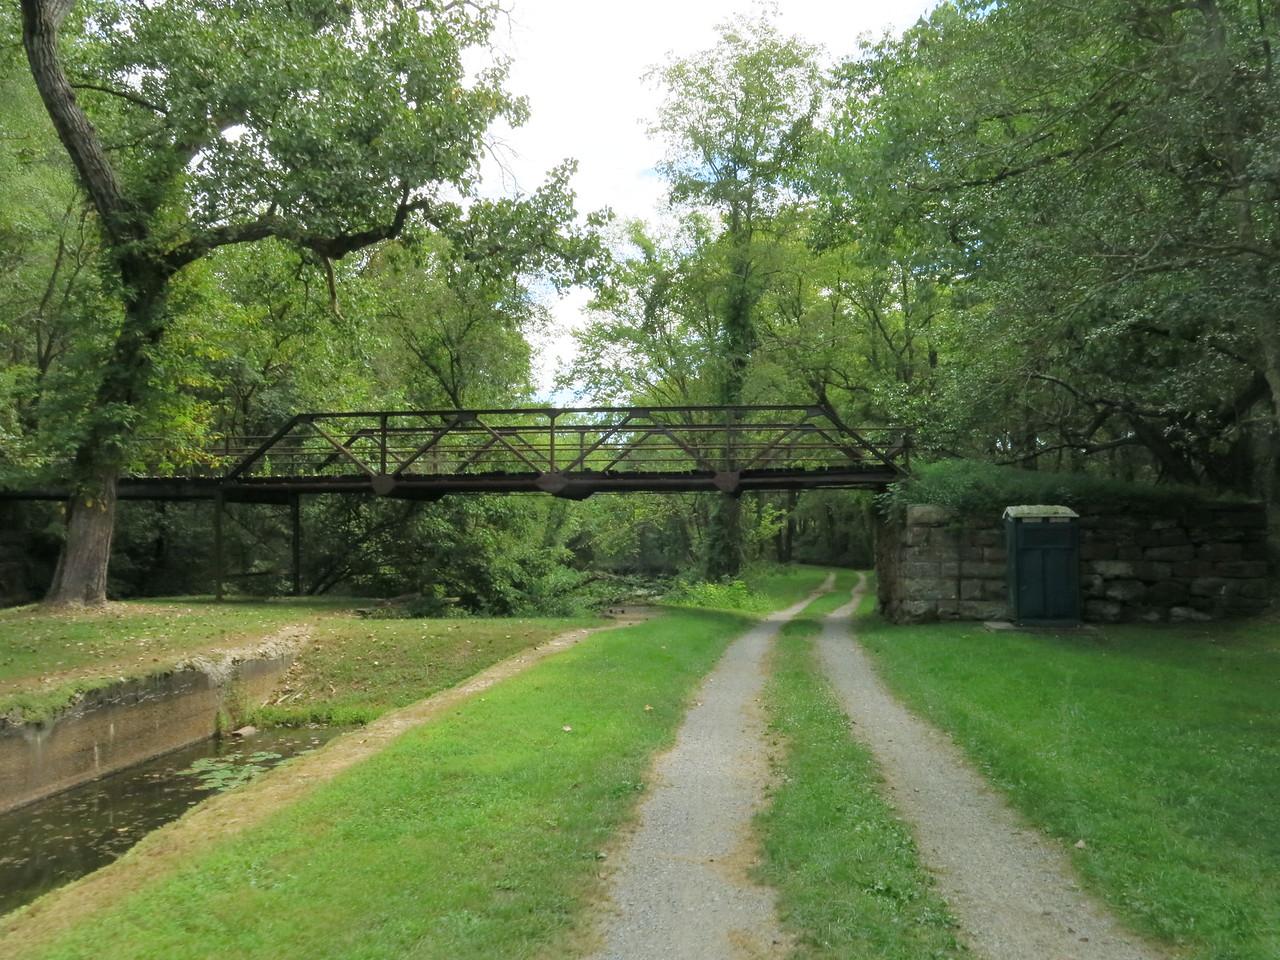 The bridge at Lock 68